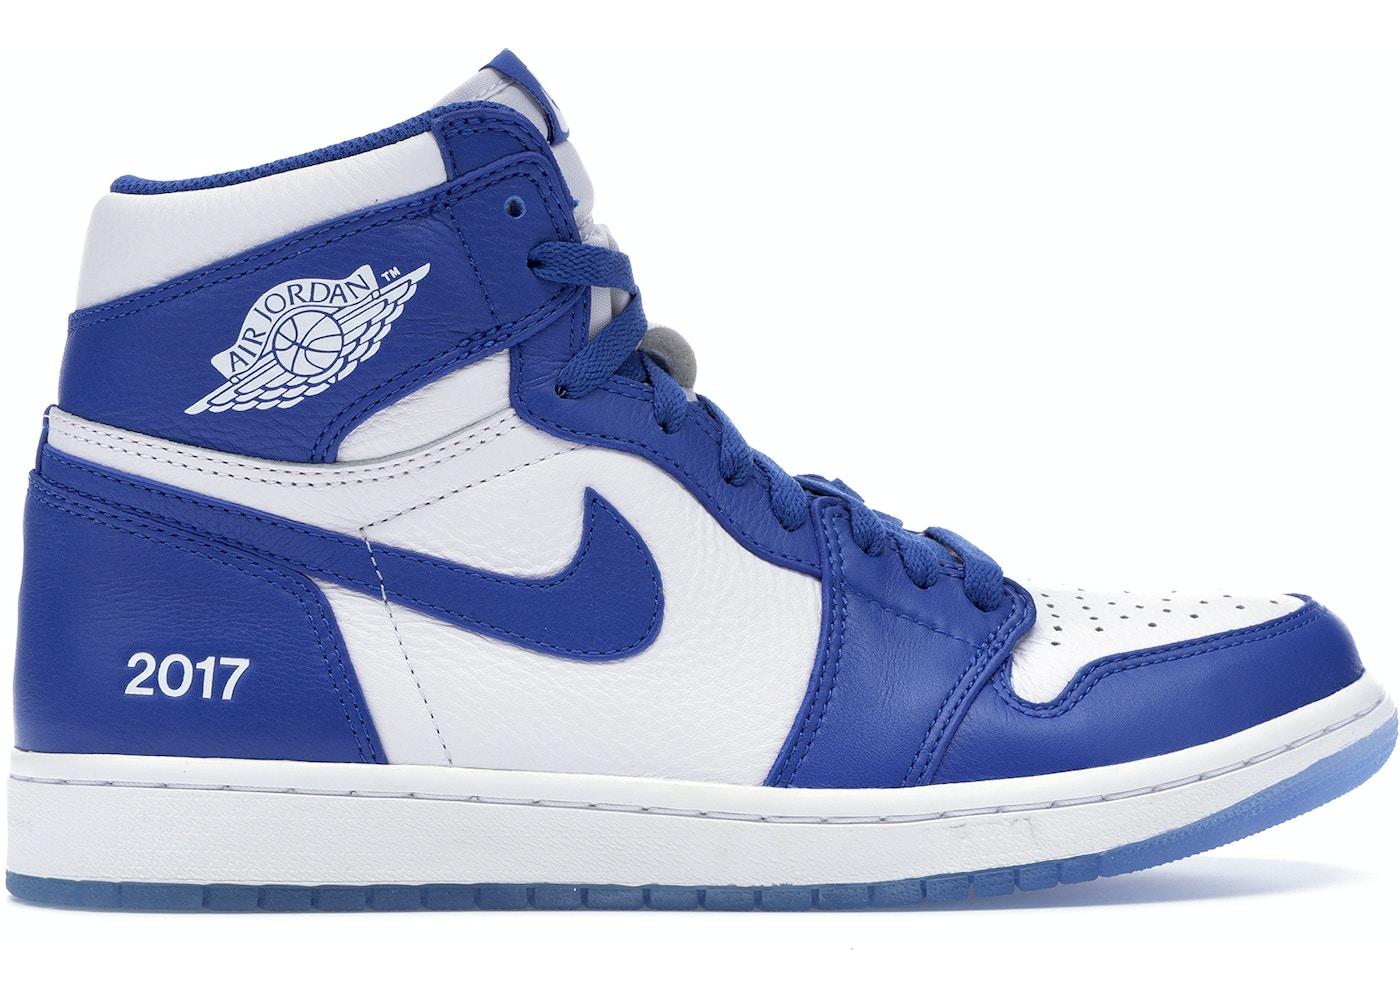 f6a57fcab1e51f Air Jordan 1 Shoes - Average Sale Price